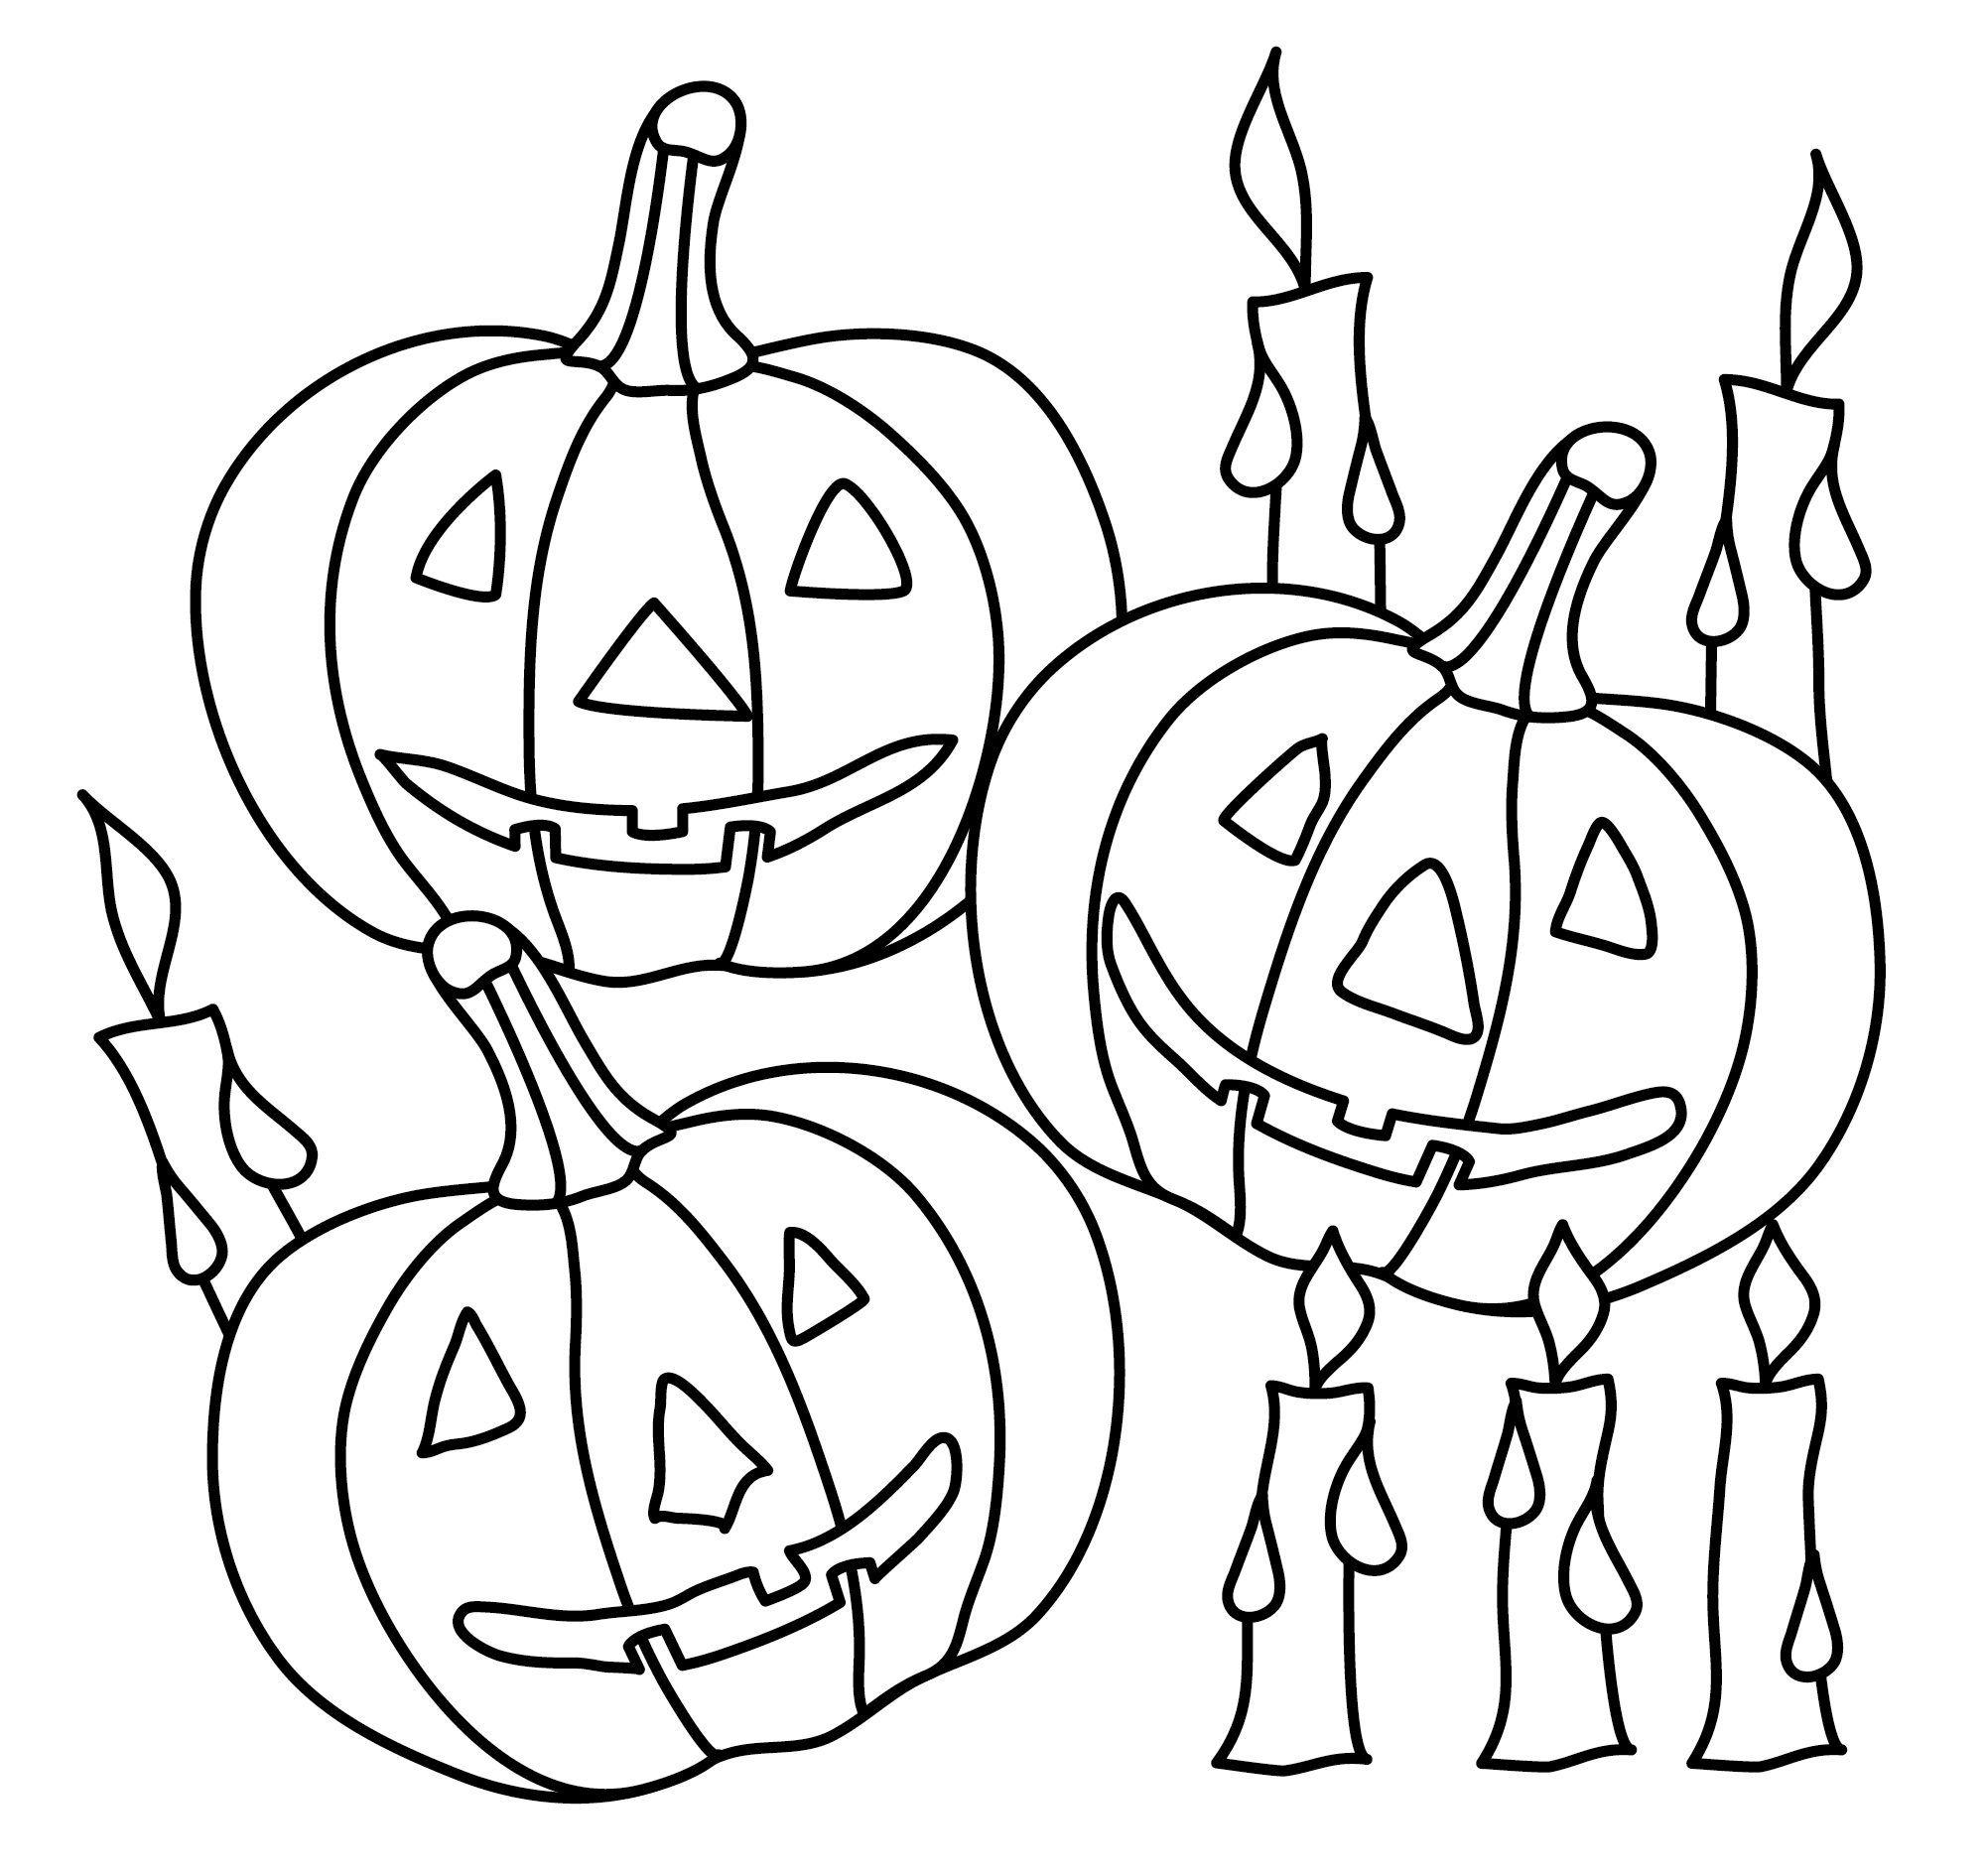 Ausmalbilder Halloween 9482395823455 E1535933432145 Coloriage Printables Halloween Vorlagen Ausdrucken Bilder Zum Ausdrucken Kostenlos Bilder Zum Ausdrucken